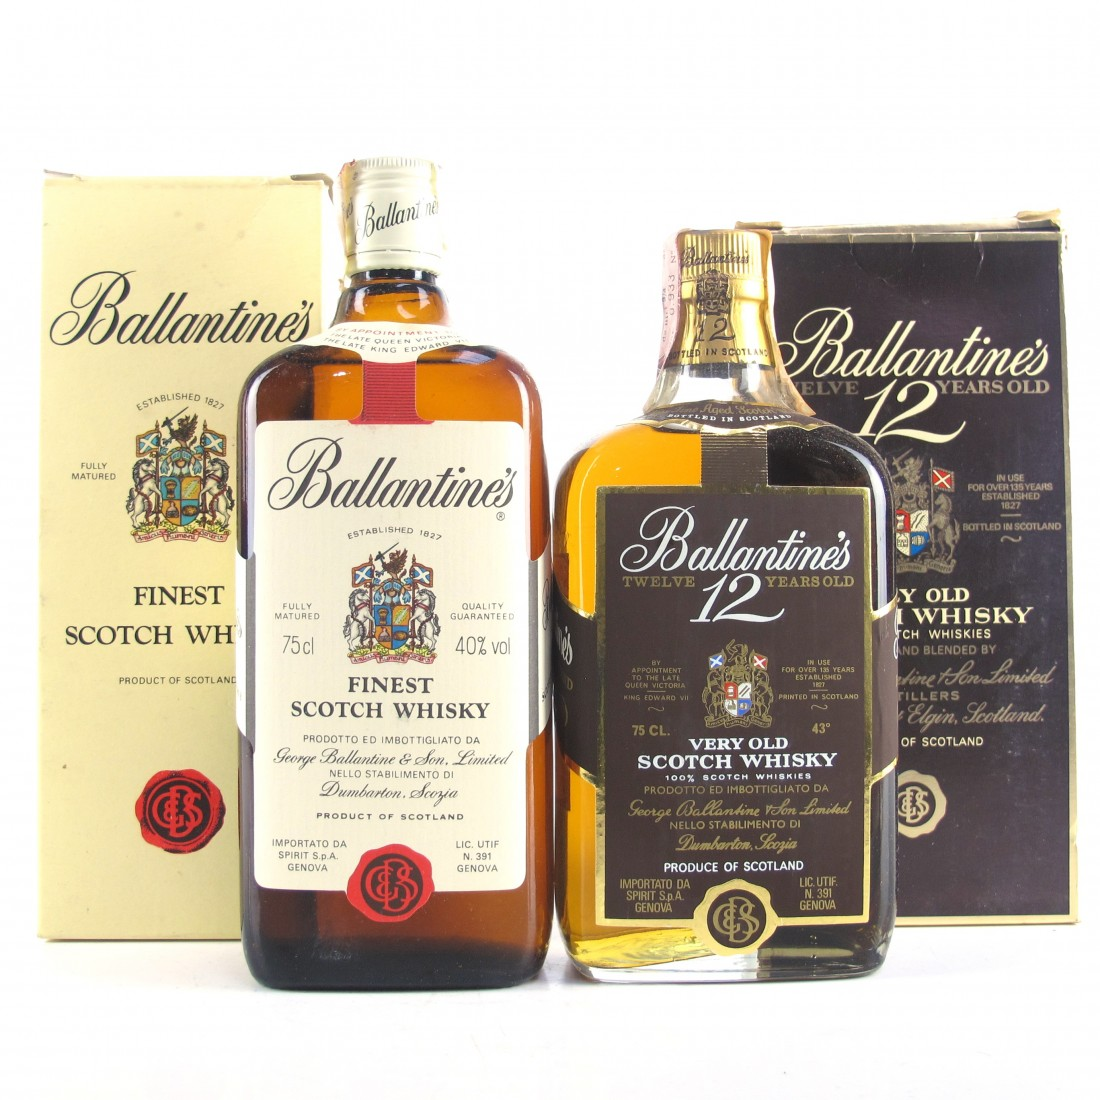 Ballantine's Scotch Whisky 1980s 2 x 75cl